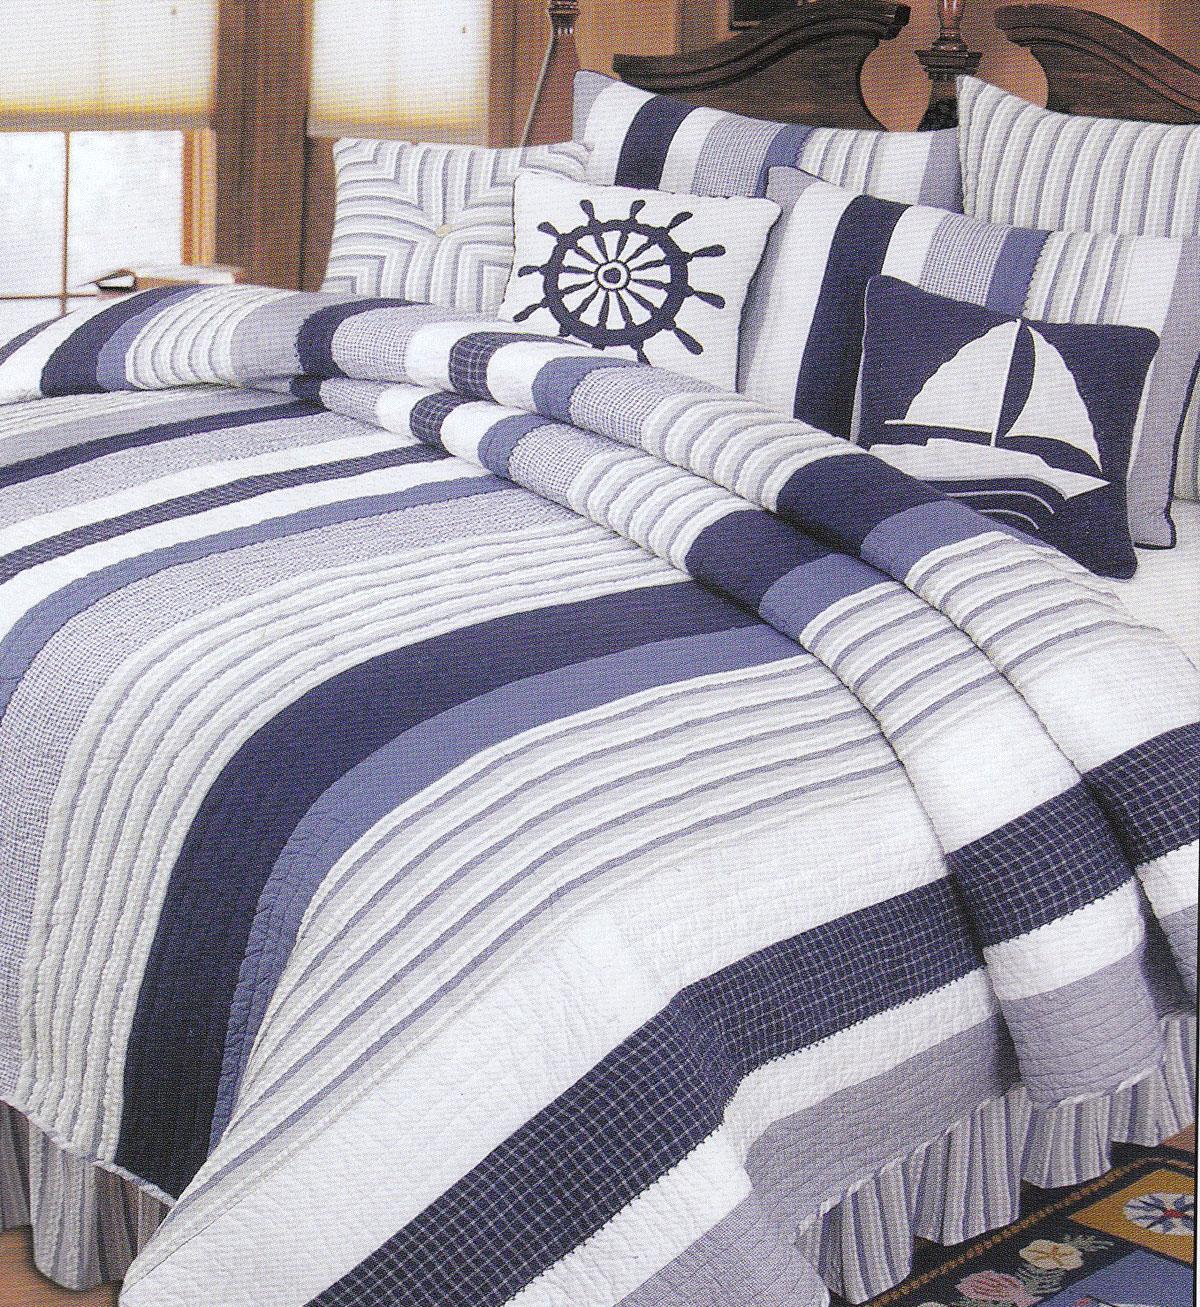 Nantucket Dream By C Amp F Quilts Beddingsuperstore Com